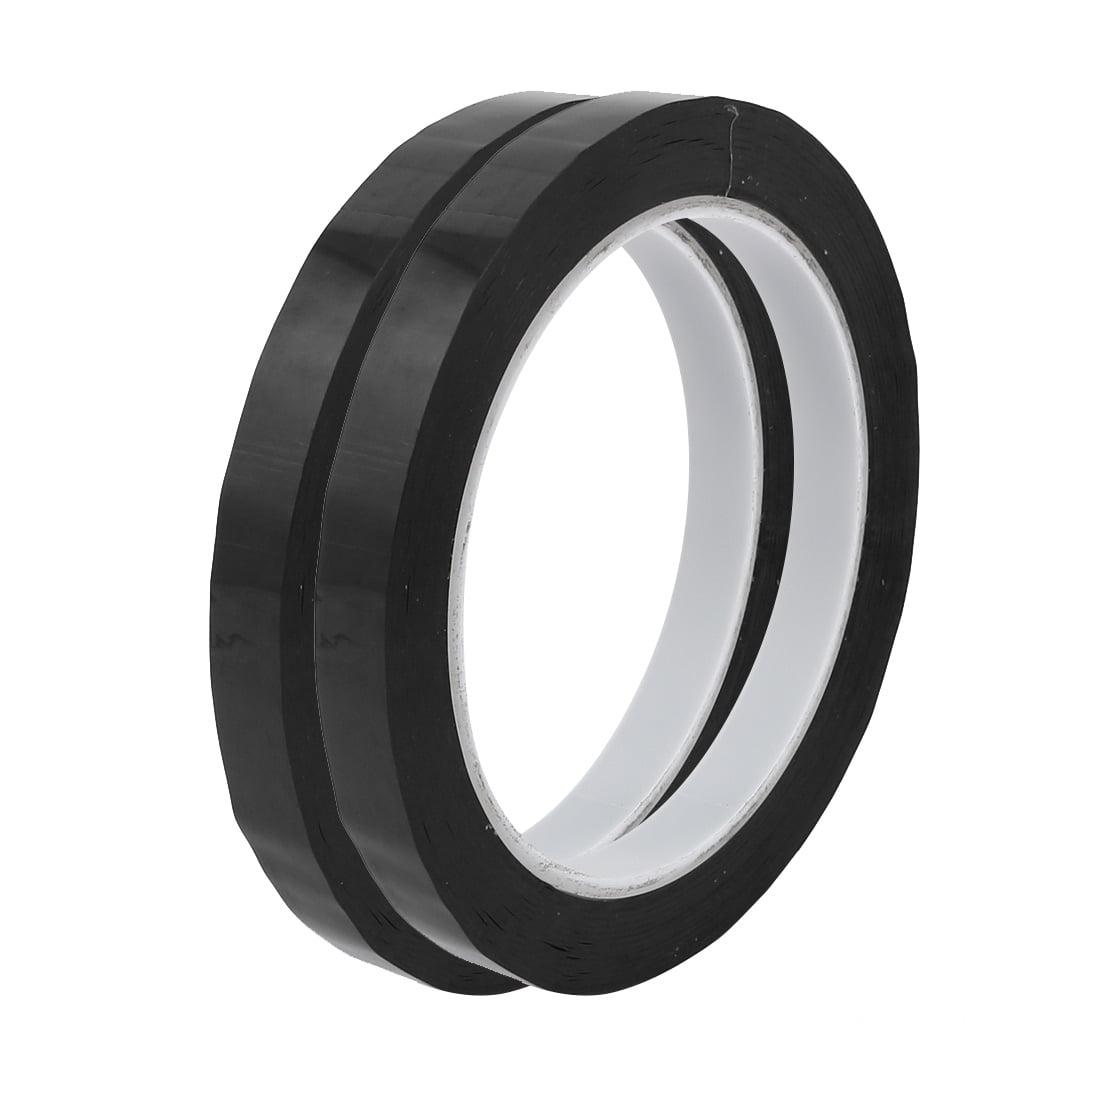 2pcs 10mm Width 66M Length Single-side Position Sign Sticker Marking Tape Black - image 3 de 3